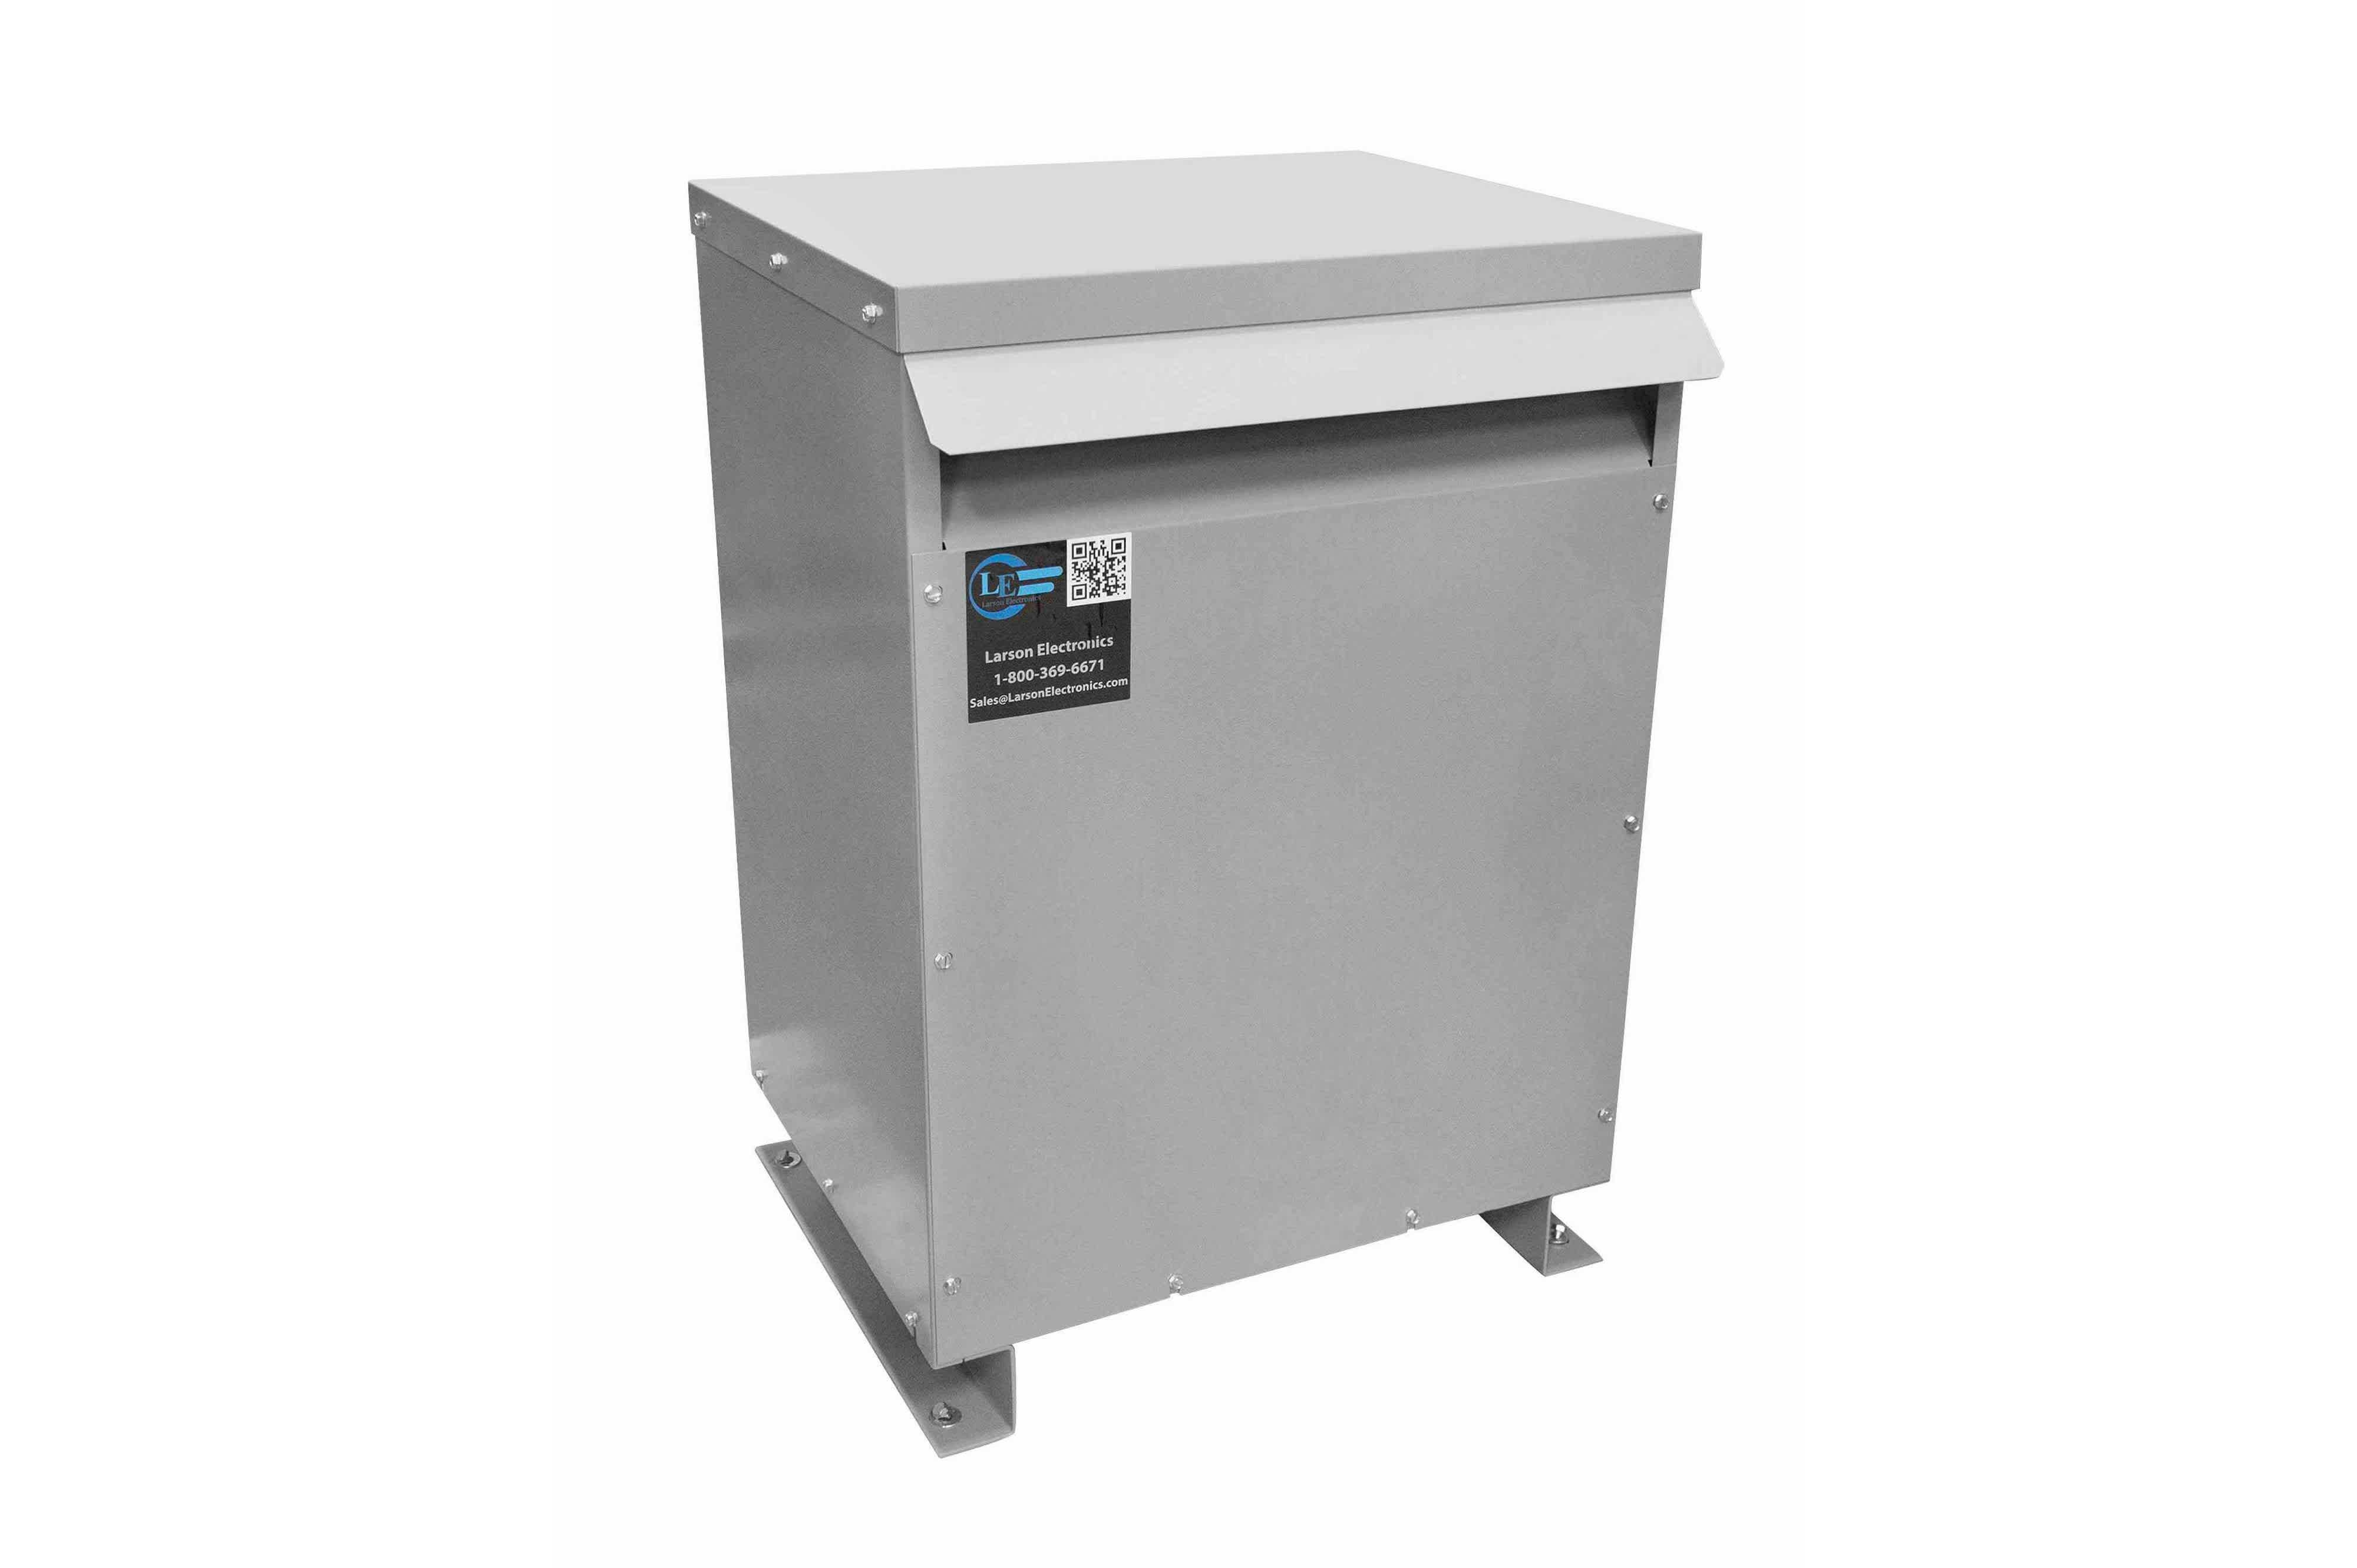 29 kVA 3PH Isolation Transformer, 230V Wye Primary, 208V Delta Secondary, N3R, Ventilated, 60 Hz